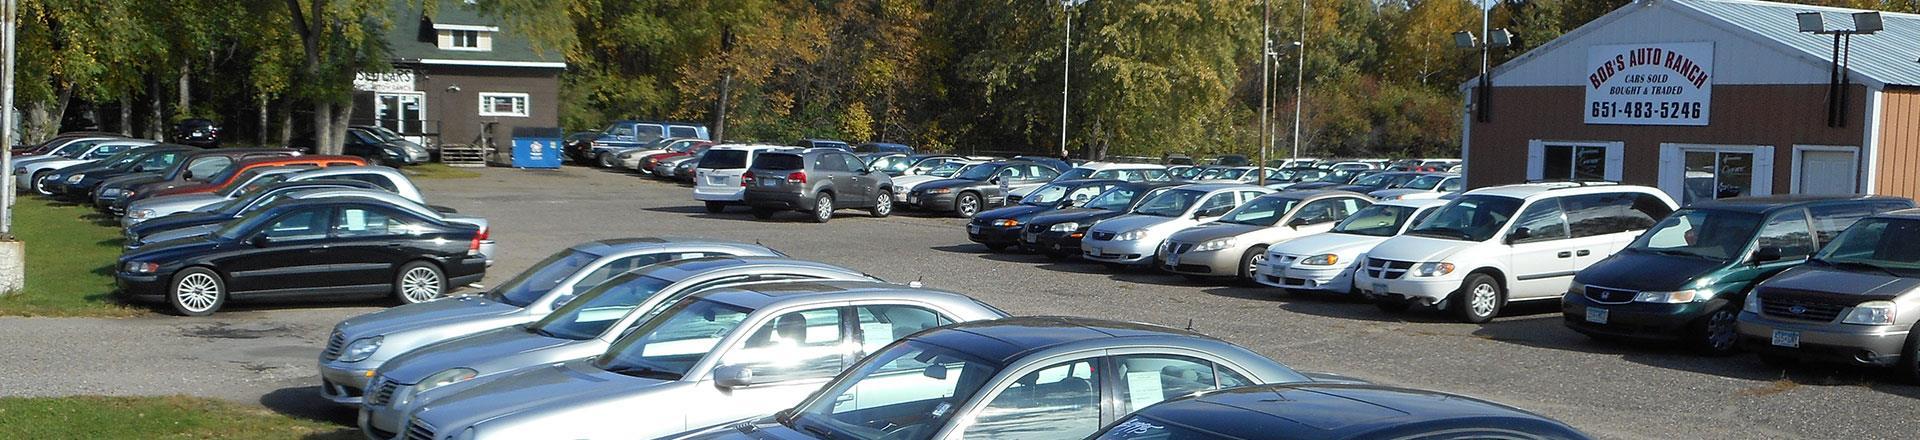 Used Cars Lino Lakes MN | Used Cars & Trucks MN | Bobs ...